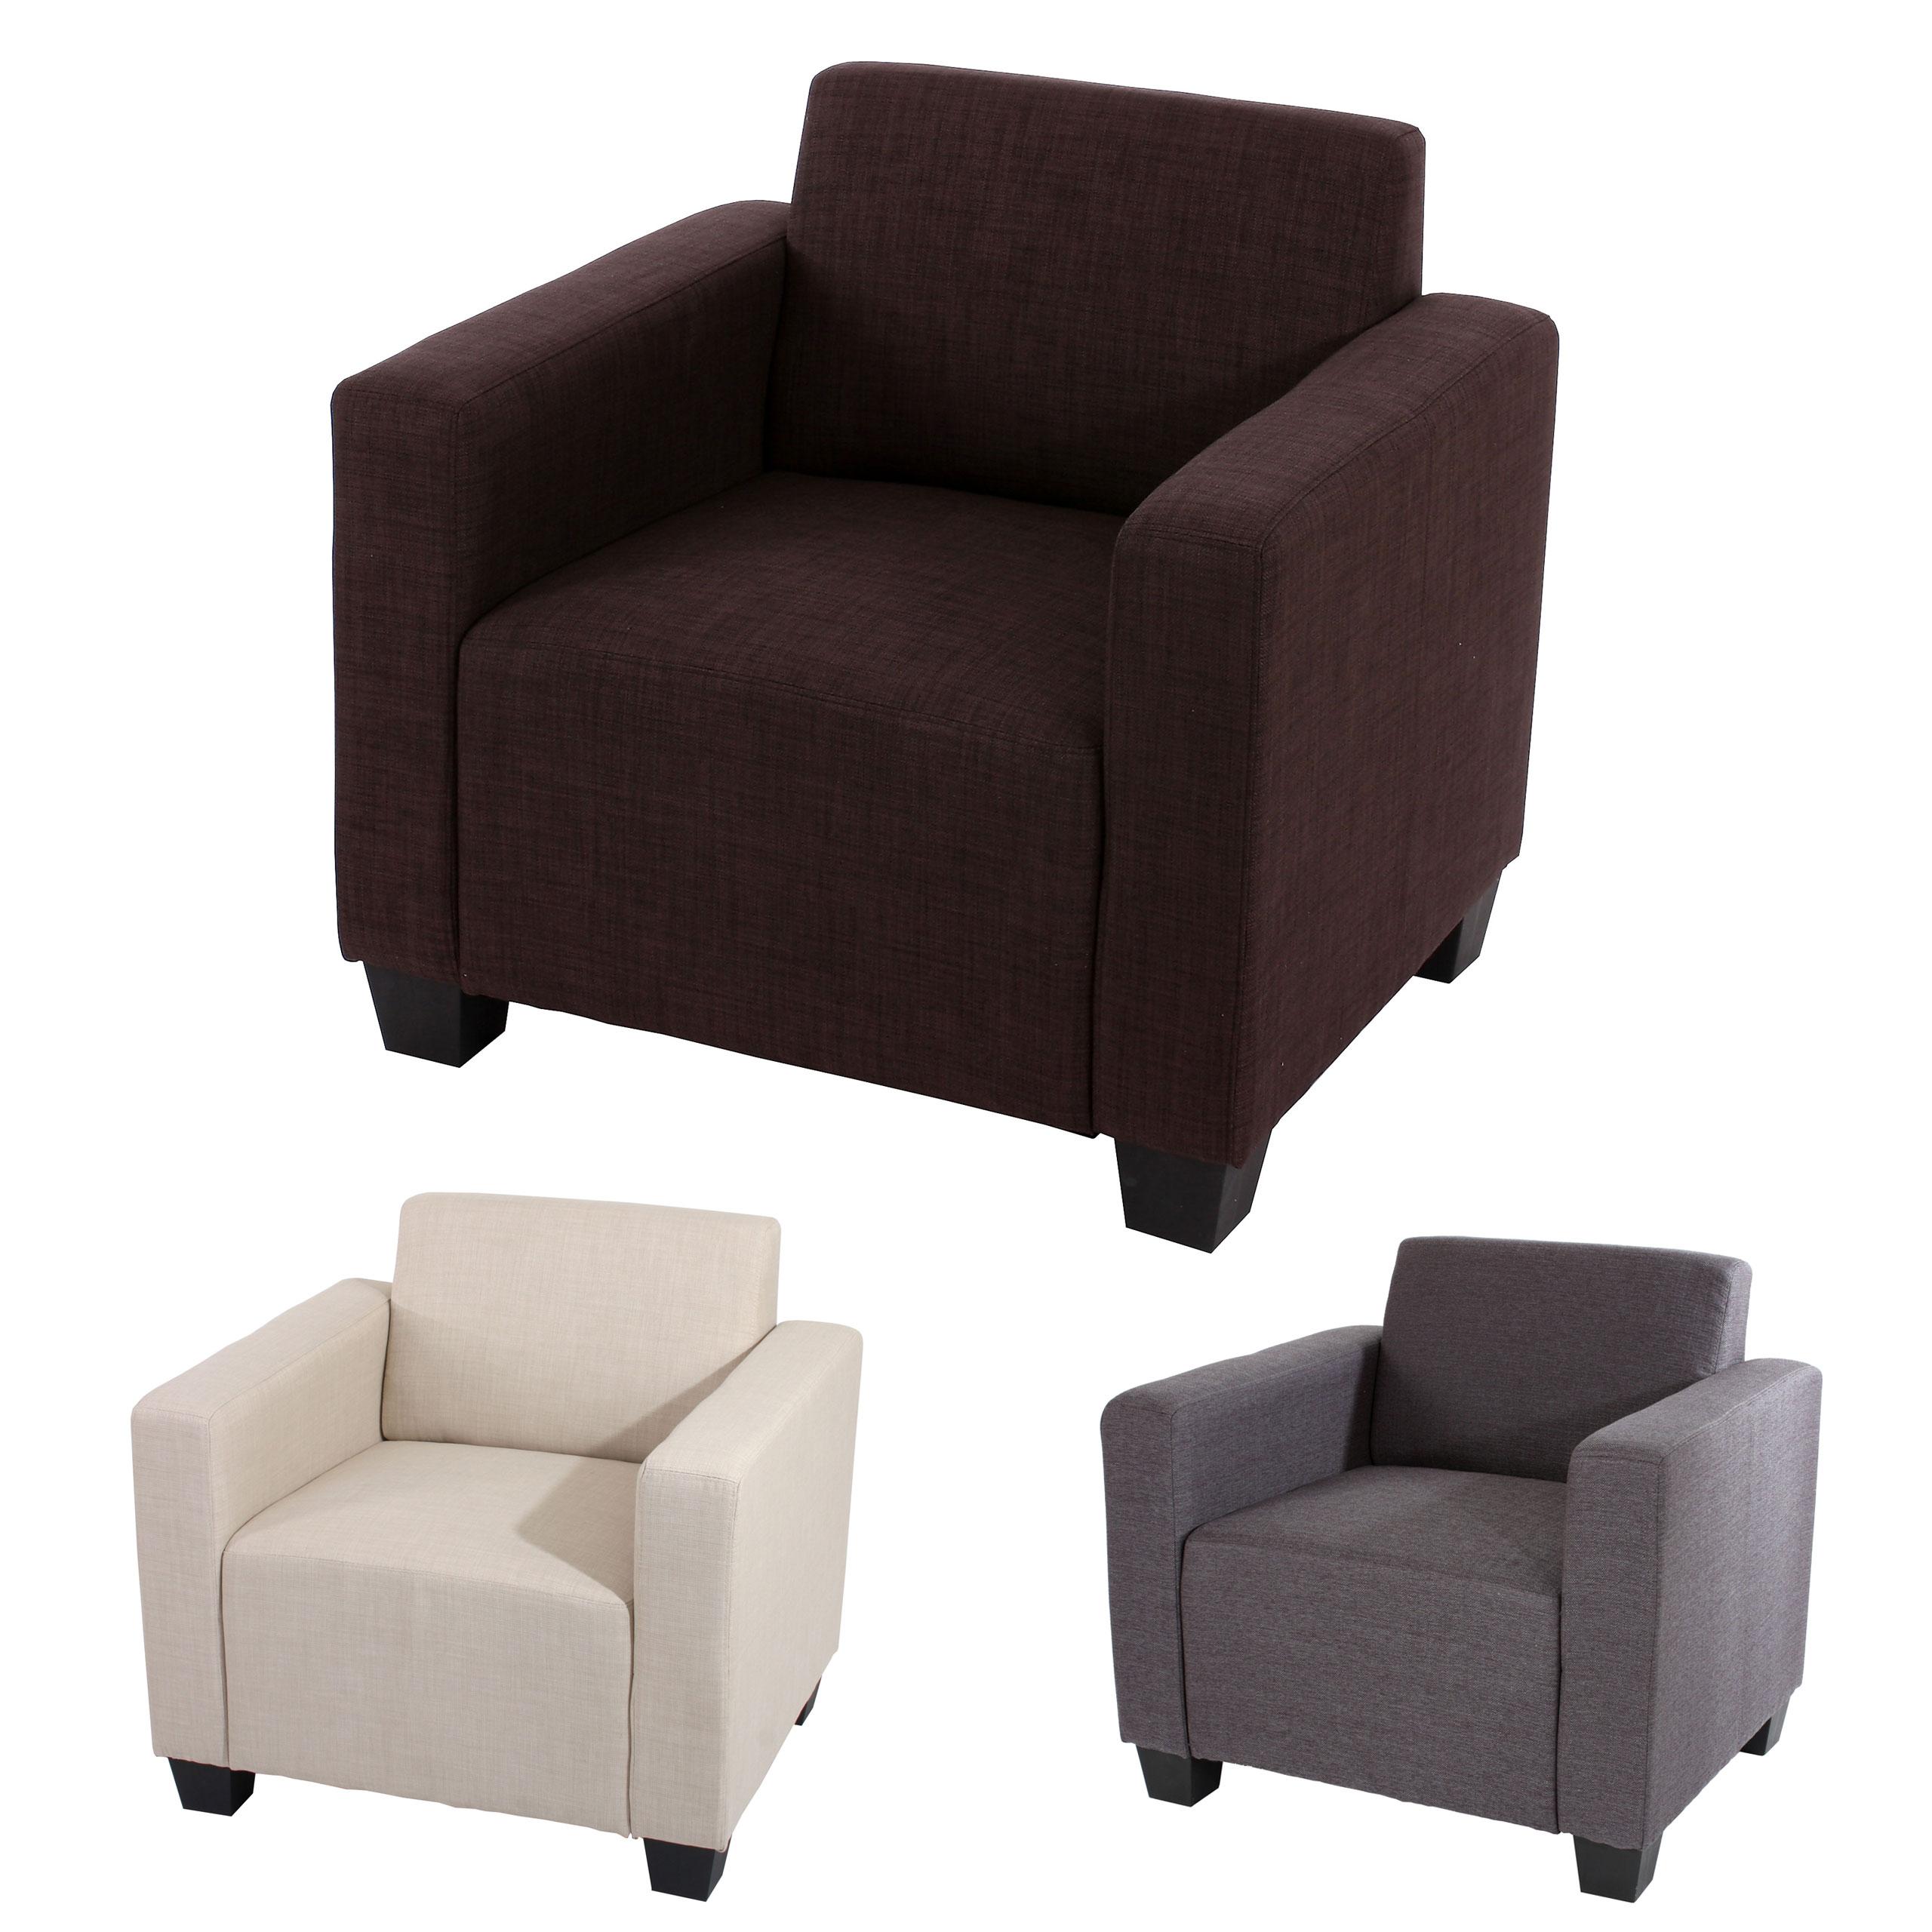 Sessel loungesessel lyon textil braun creme anthrazit ebay for Sessel textil